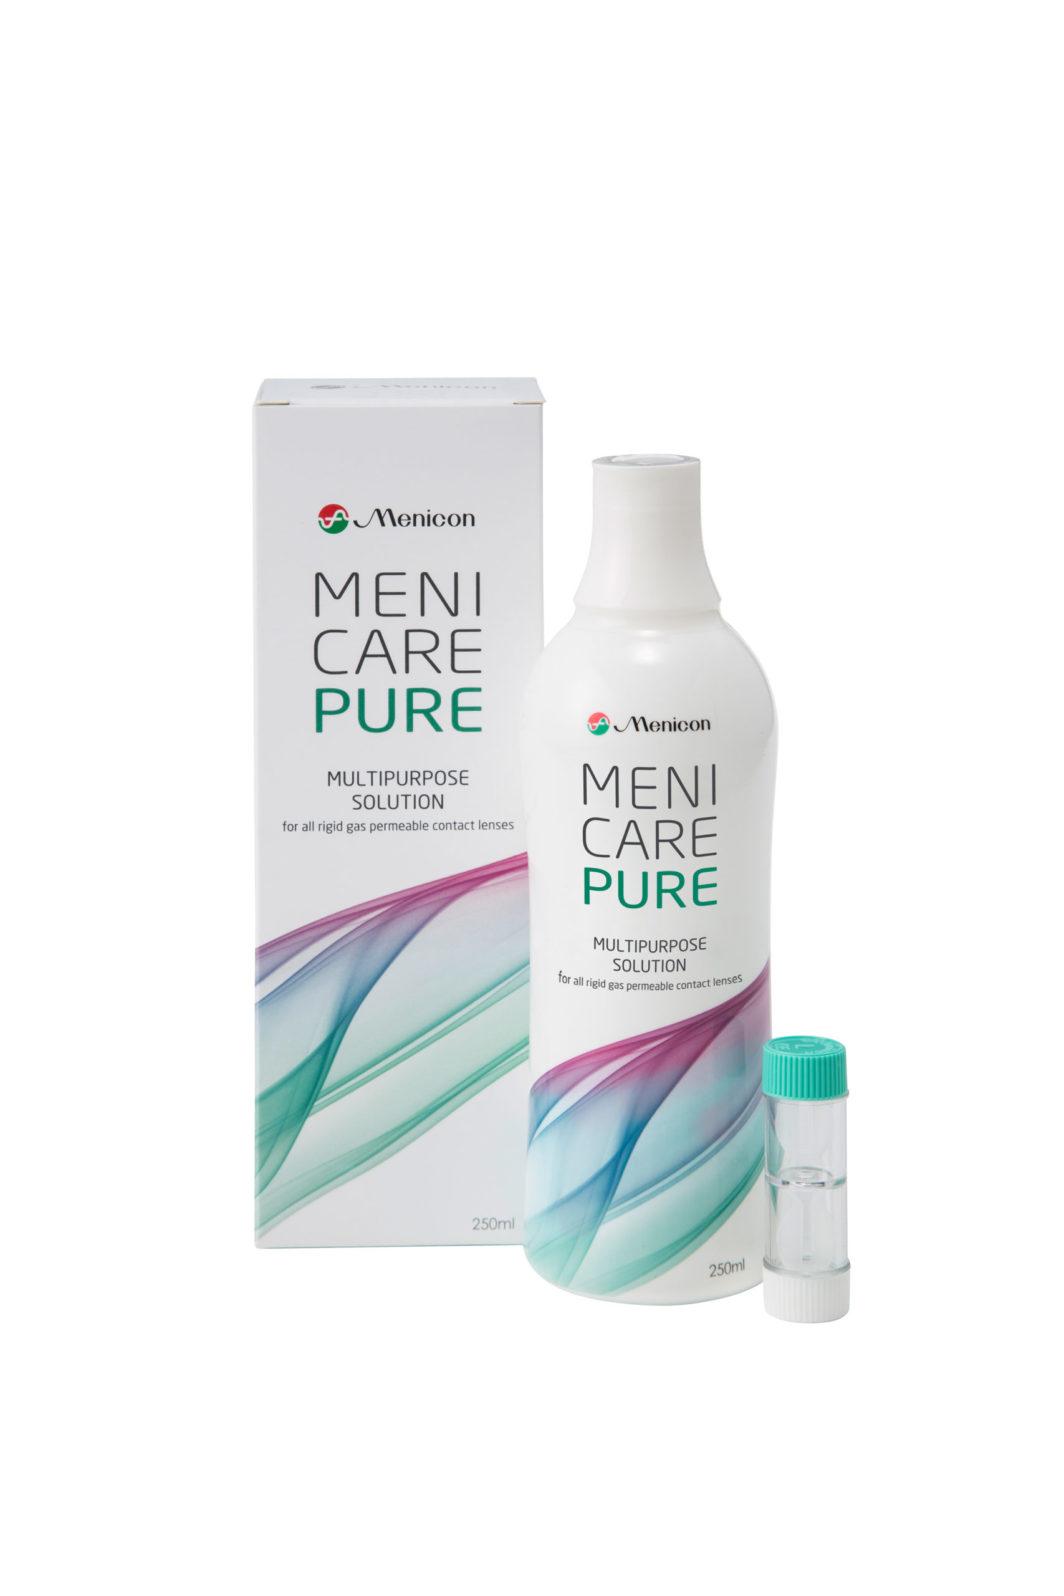 MeniCare Pure 250 ml 1 scaled 1064x1596 - MeniCare Pure